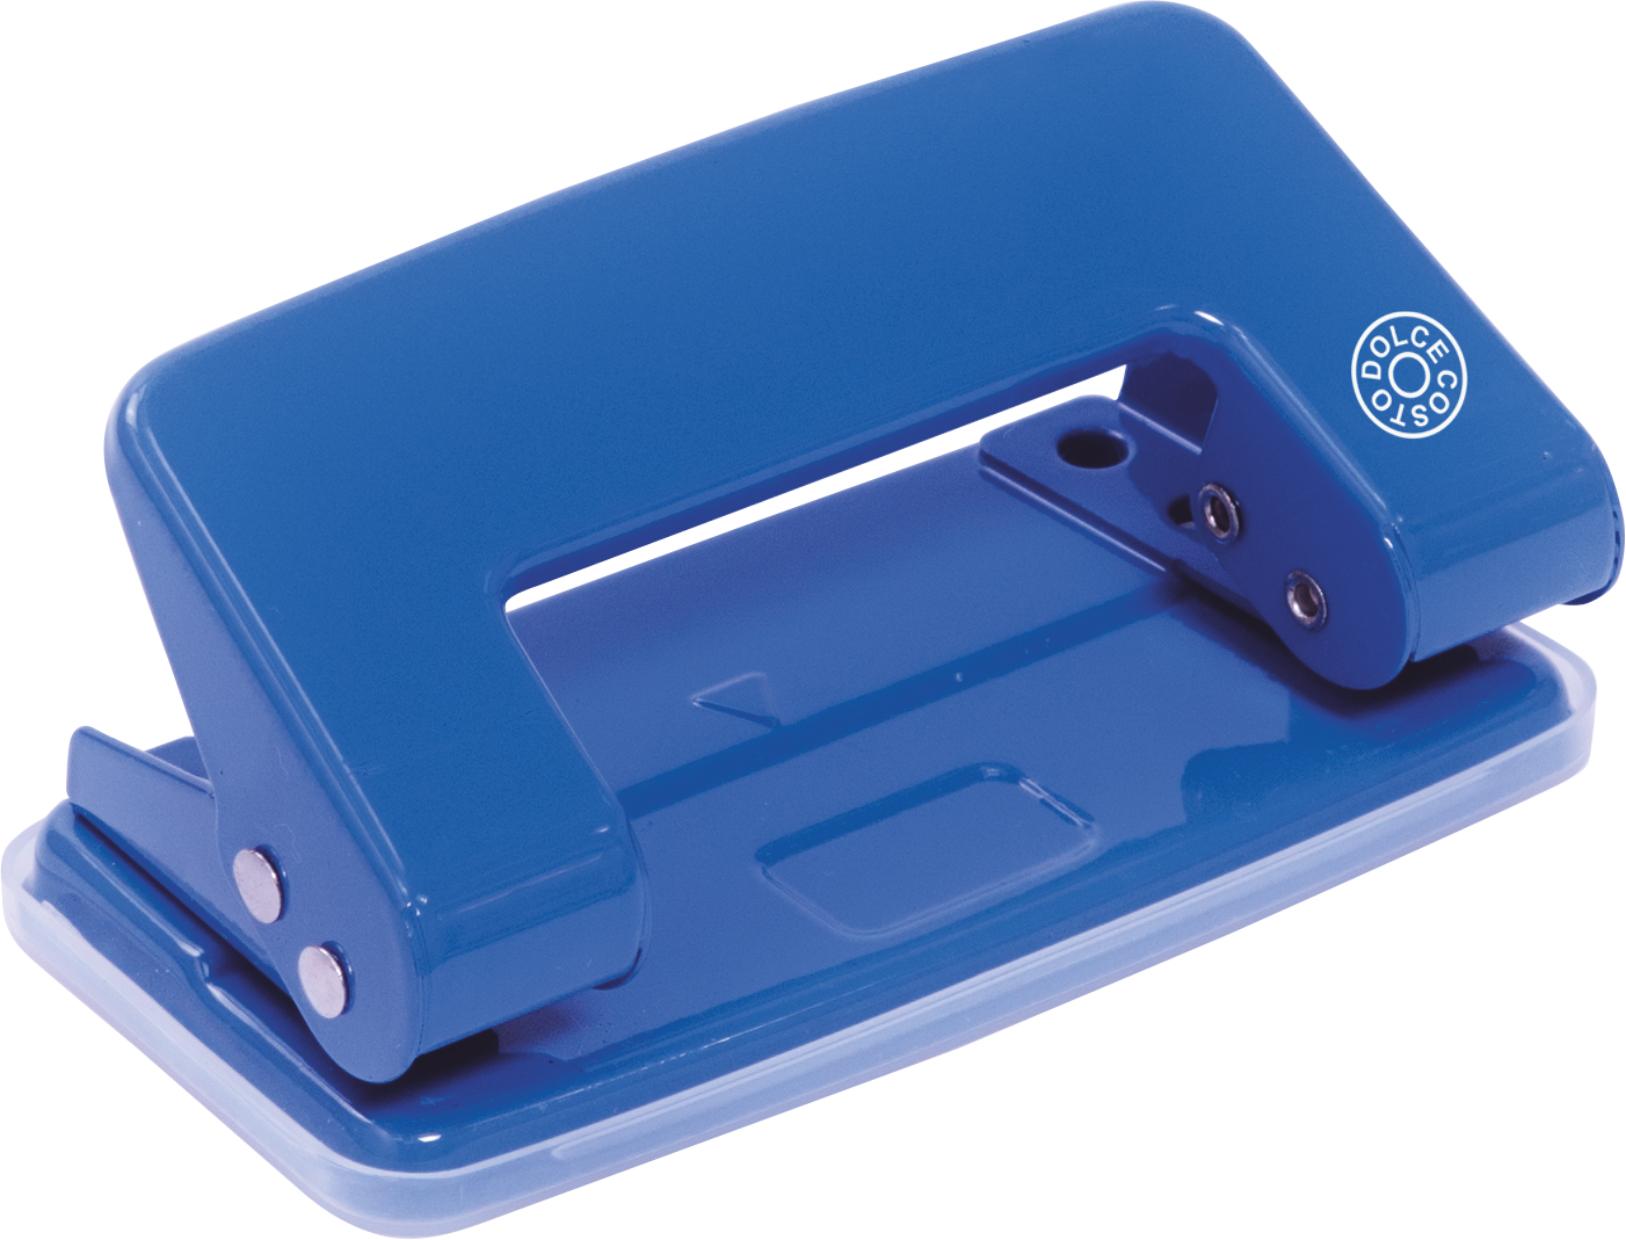 Дырокол 10л Dolce Costo синий метал корпус